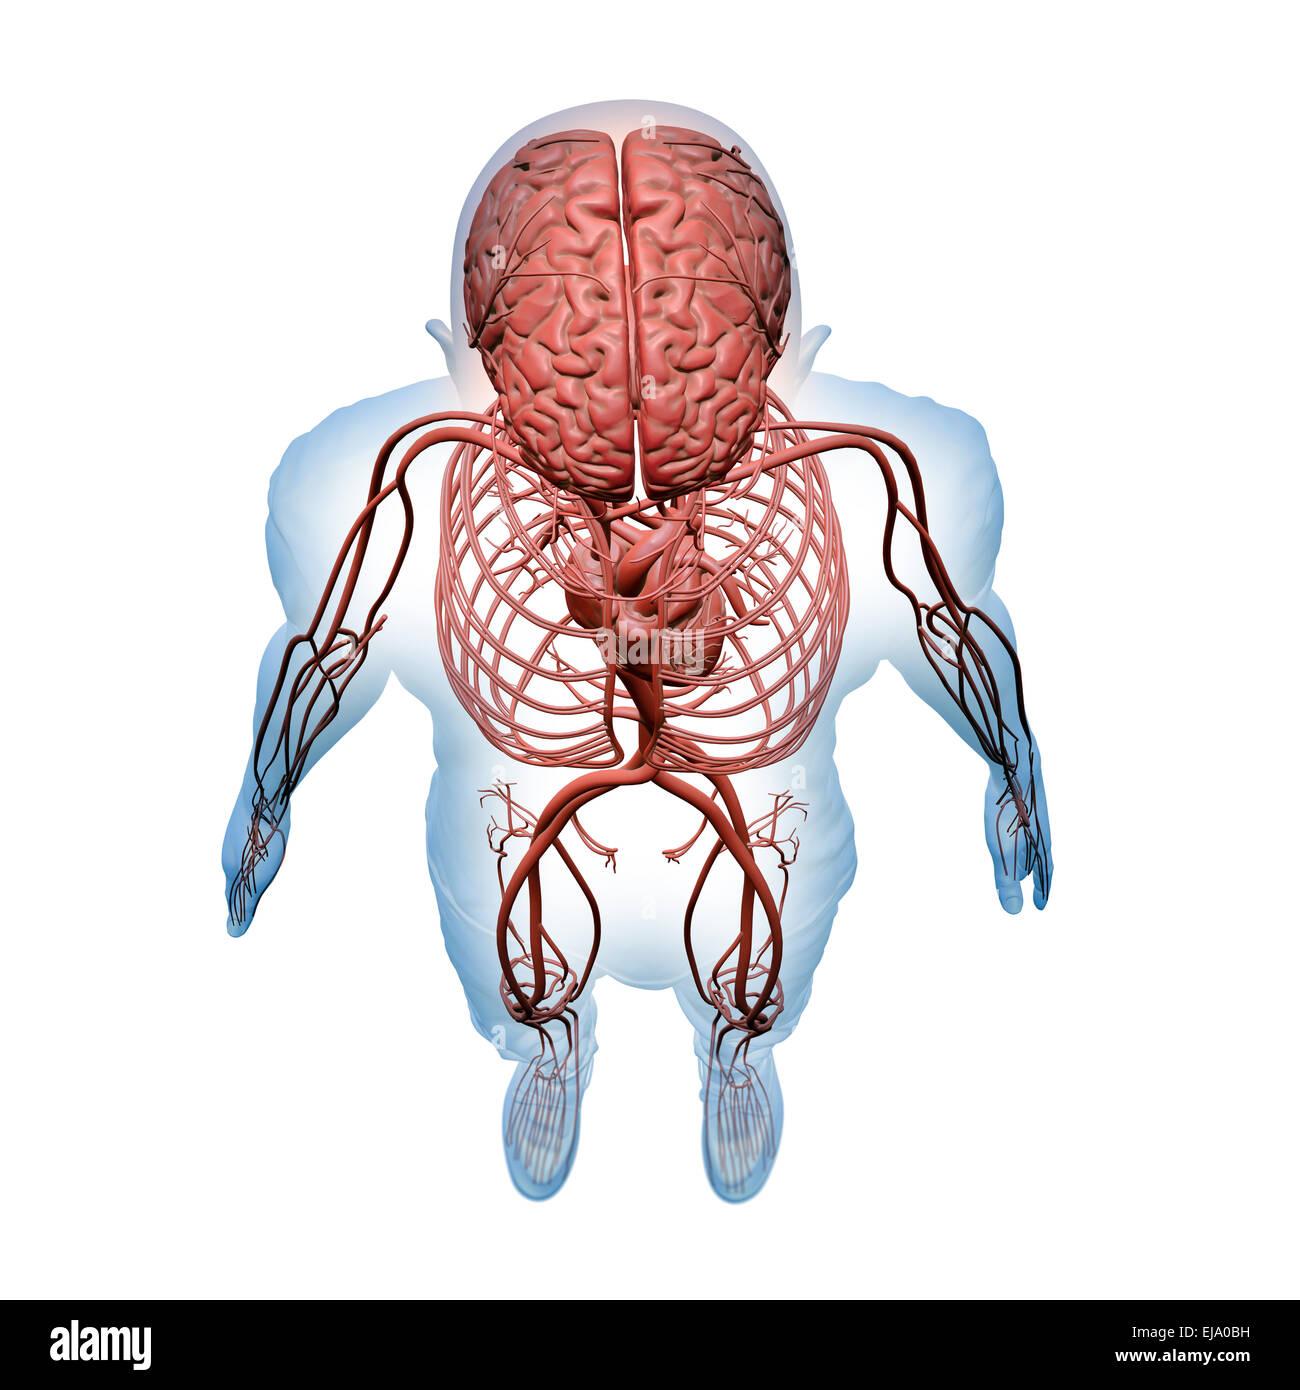 Human Organ Systems Stock Photos & Human Organ Systems Stock Images ...